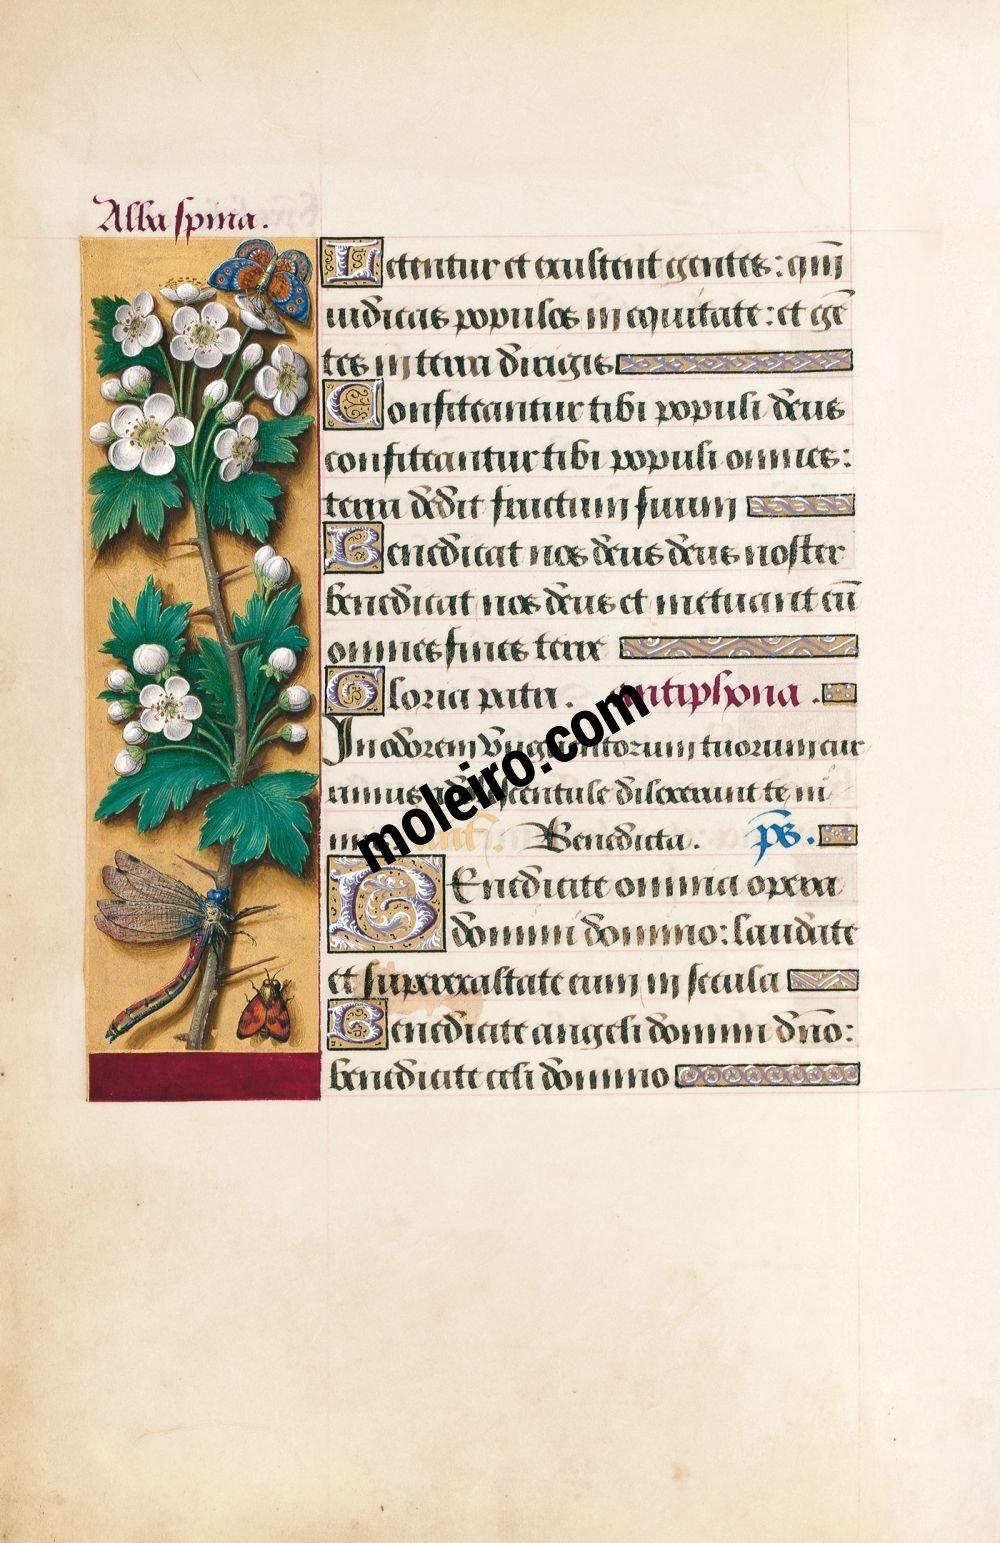 Las Grandes Horas de Ana de Bretaña f. 39v, Espino albar